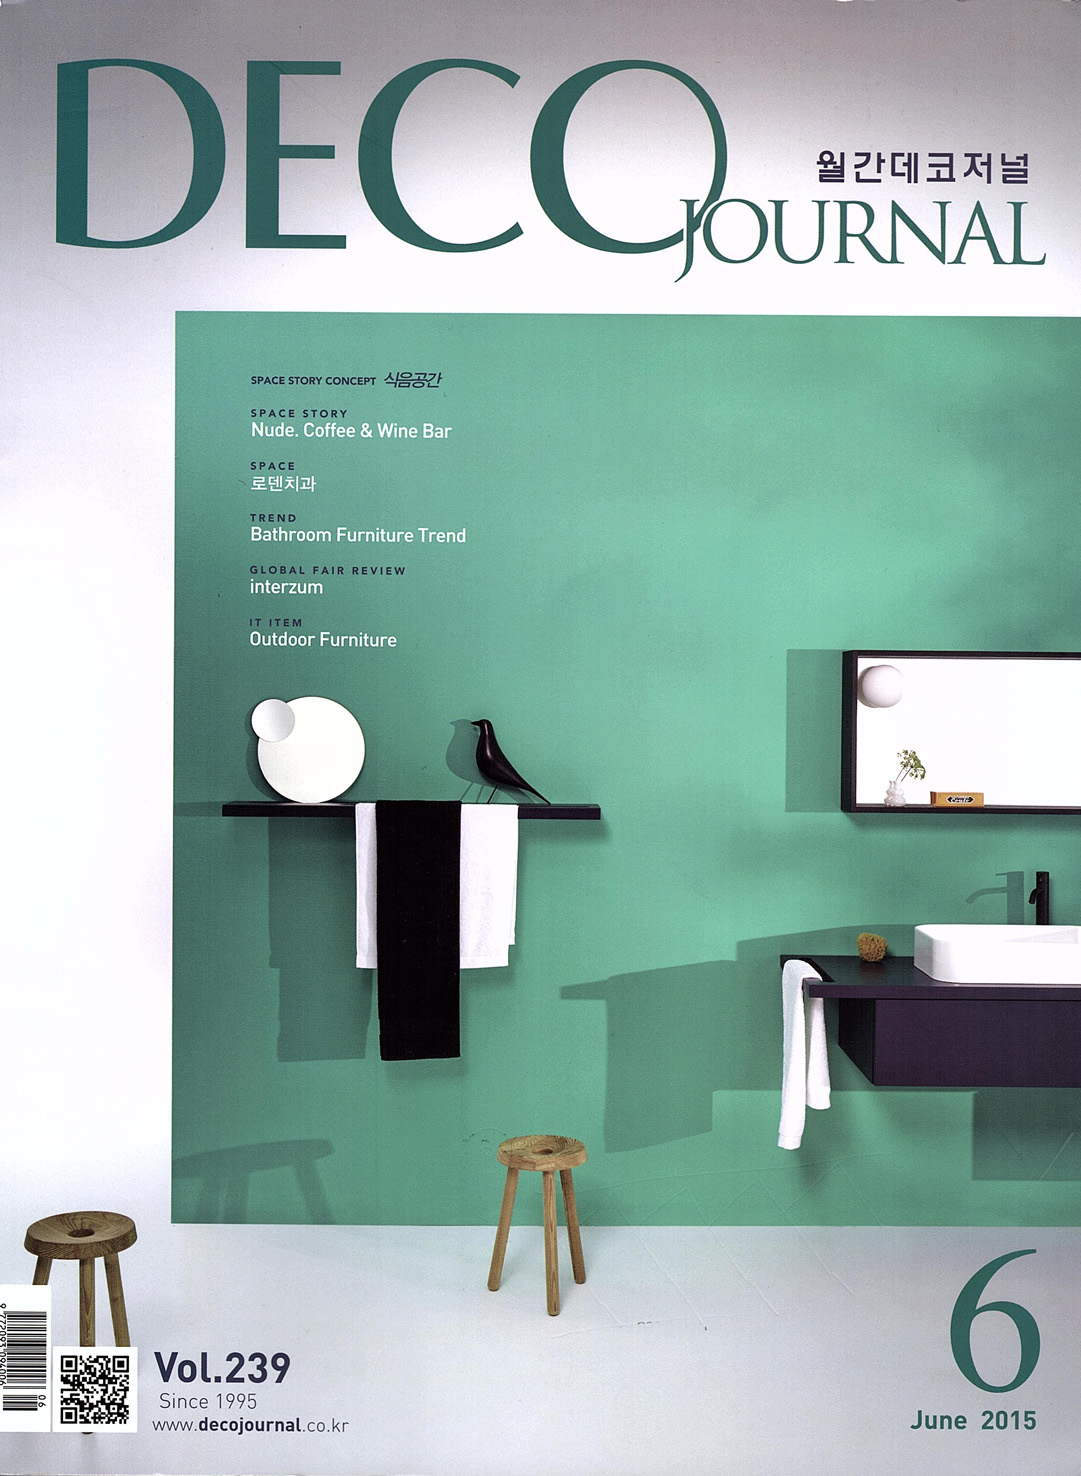 Burro e Salvia on Deco Journal